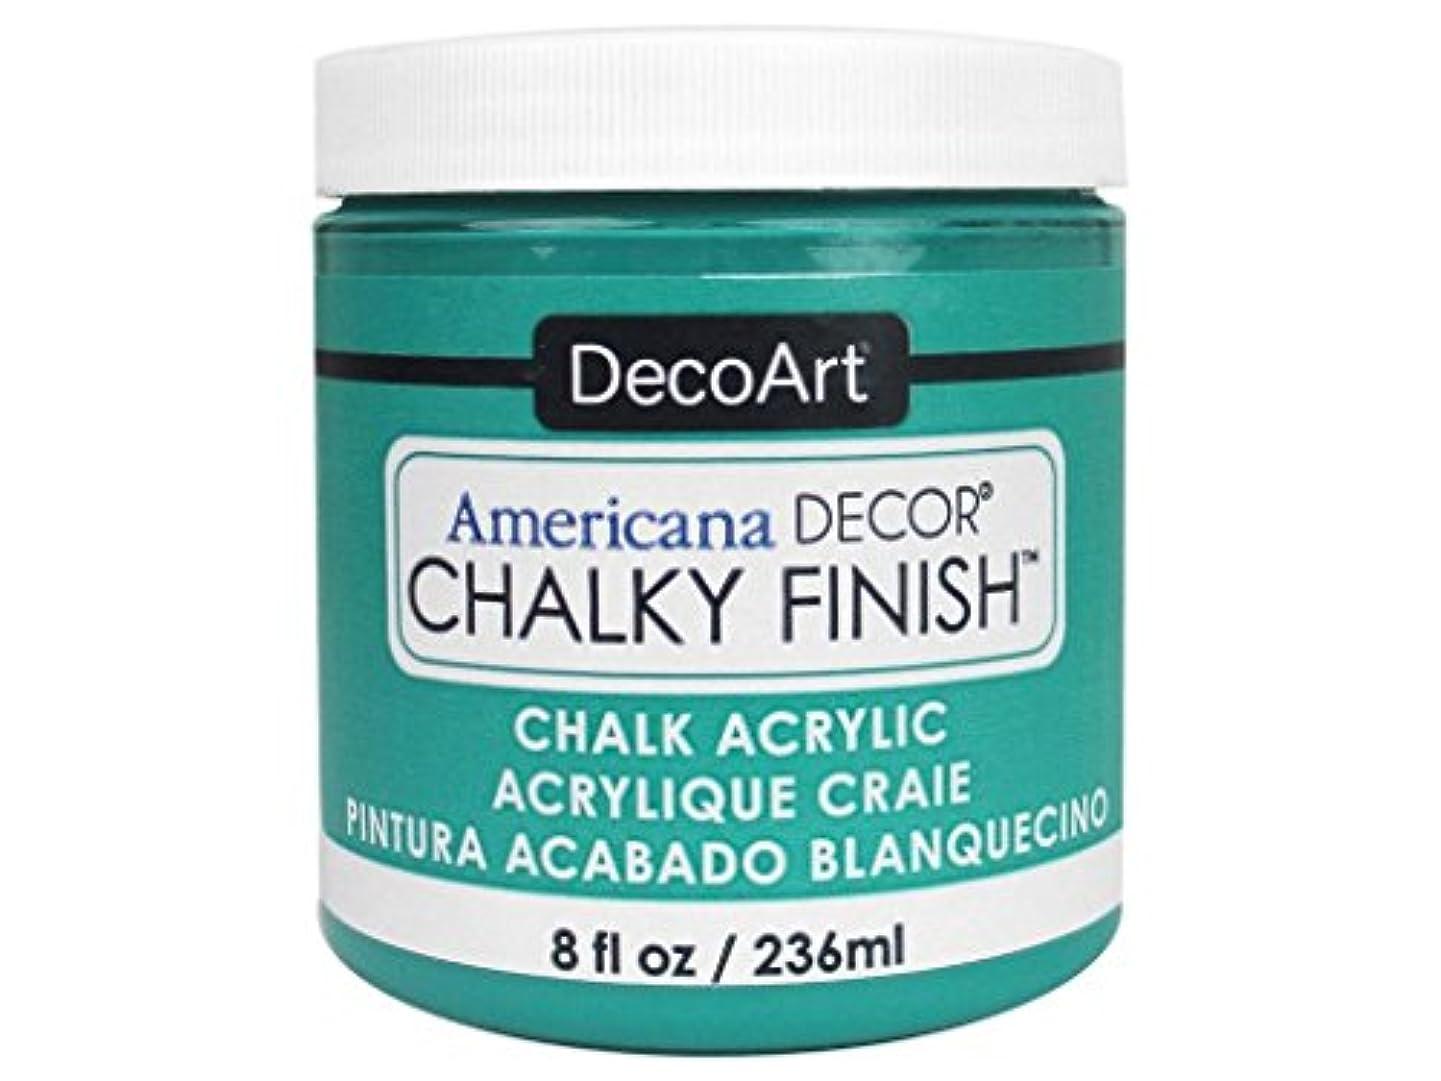 DecoArt Ameri Americana Decor Chalky Finish 8oz Keepsake